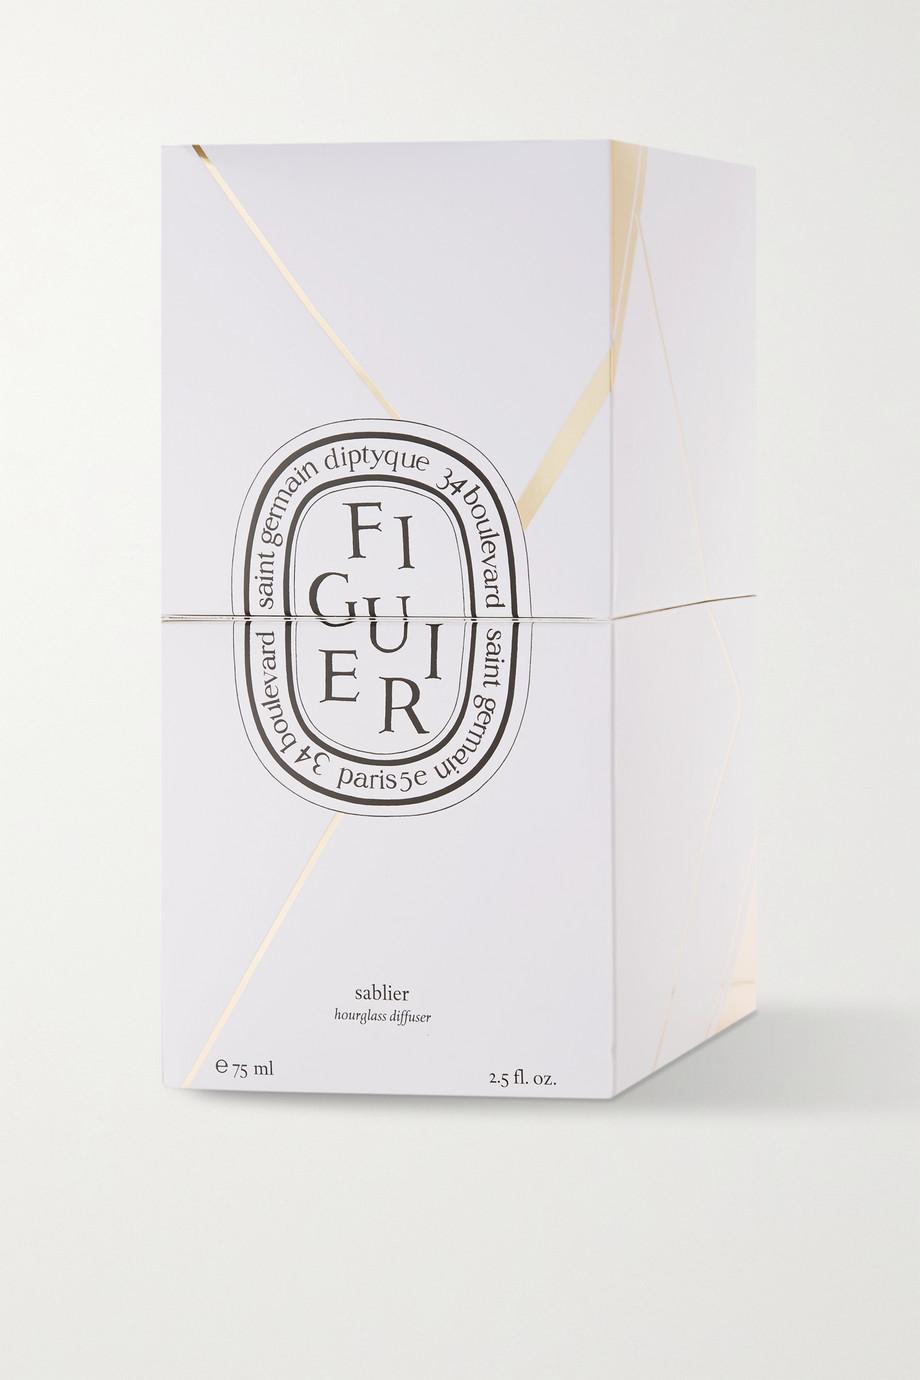 Diptyque Figuier Hourglass Diffuser, 75 ml – Diffuser